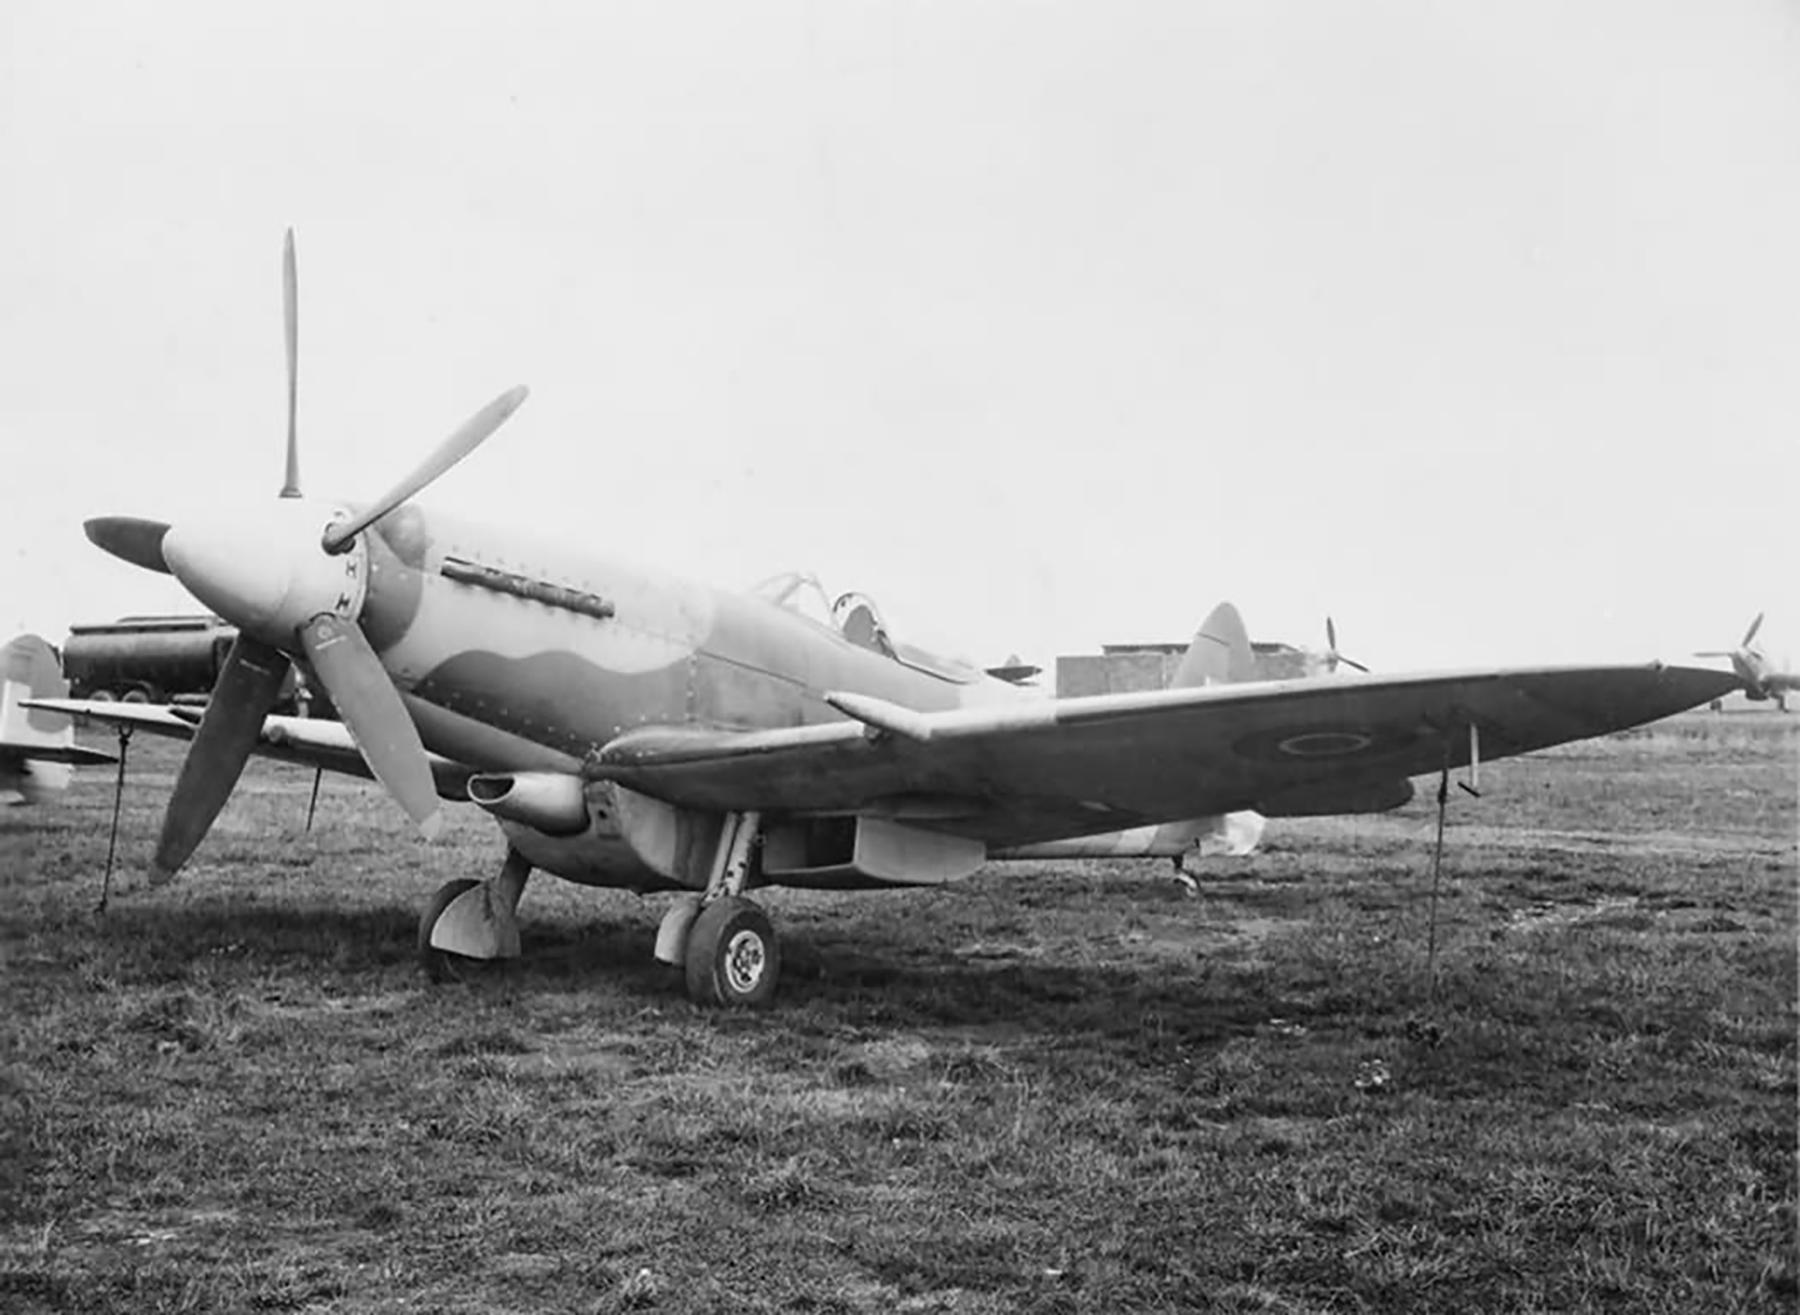 Spitfire F18 on the ground web 01